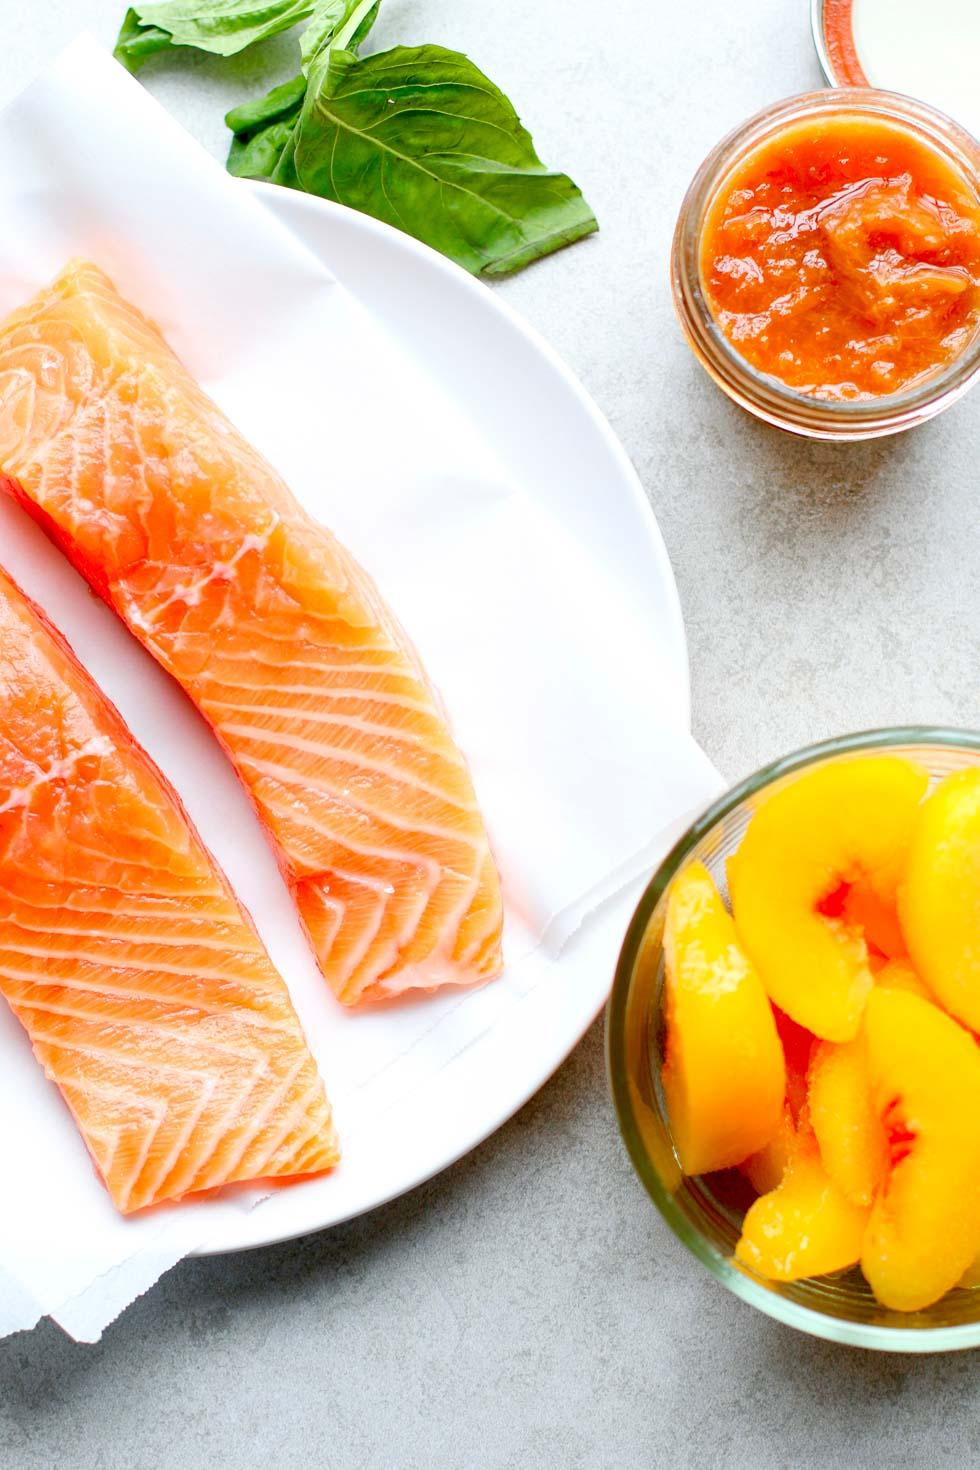 How to Make Peach Glazed Salmon - Ingredients